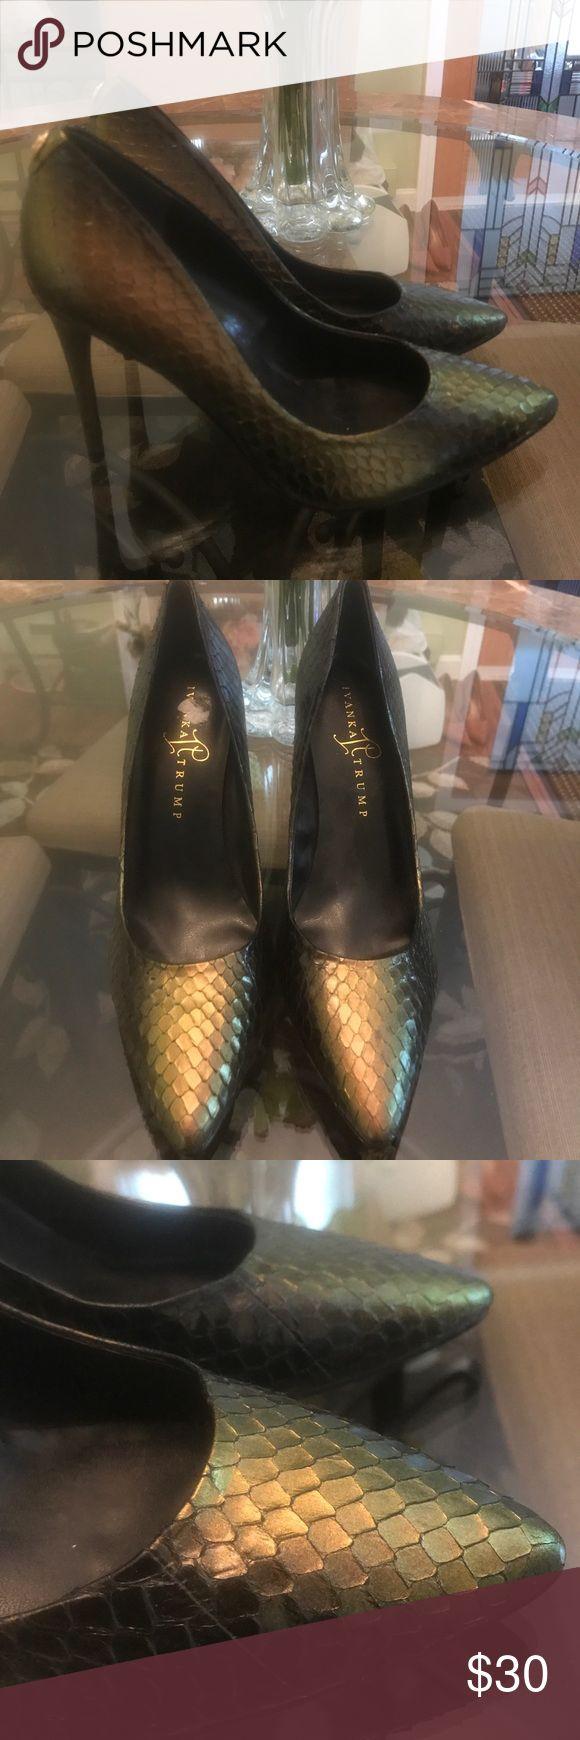 ⚠️TODAY ONLY⚠️ Sexy Ivanka Trump Heels Size 8 Beautiful and classy Ivanka Trump heels, Size 8. Never worn, like new condition. Ivanka Trump Shoes Heels